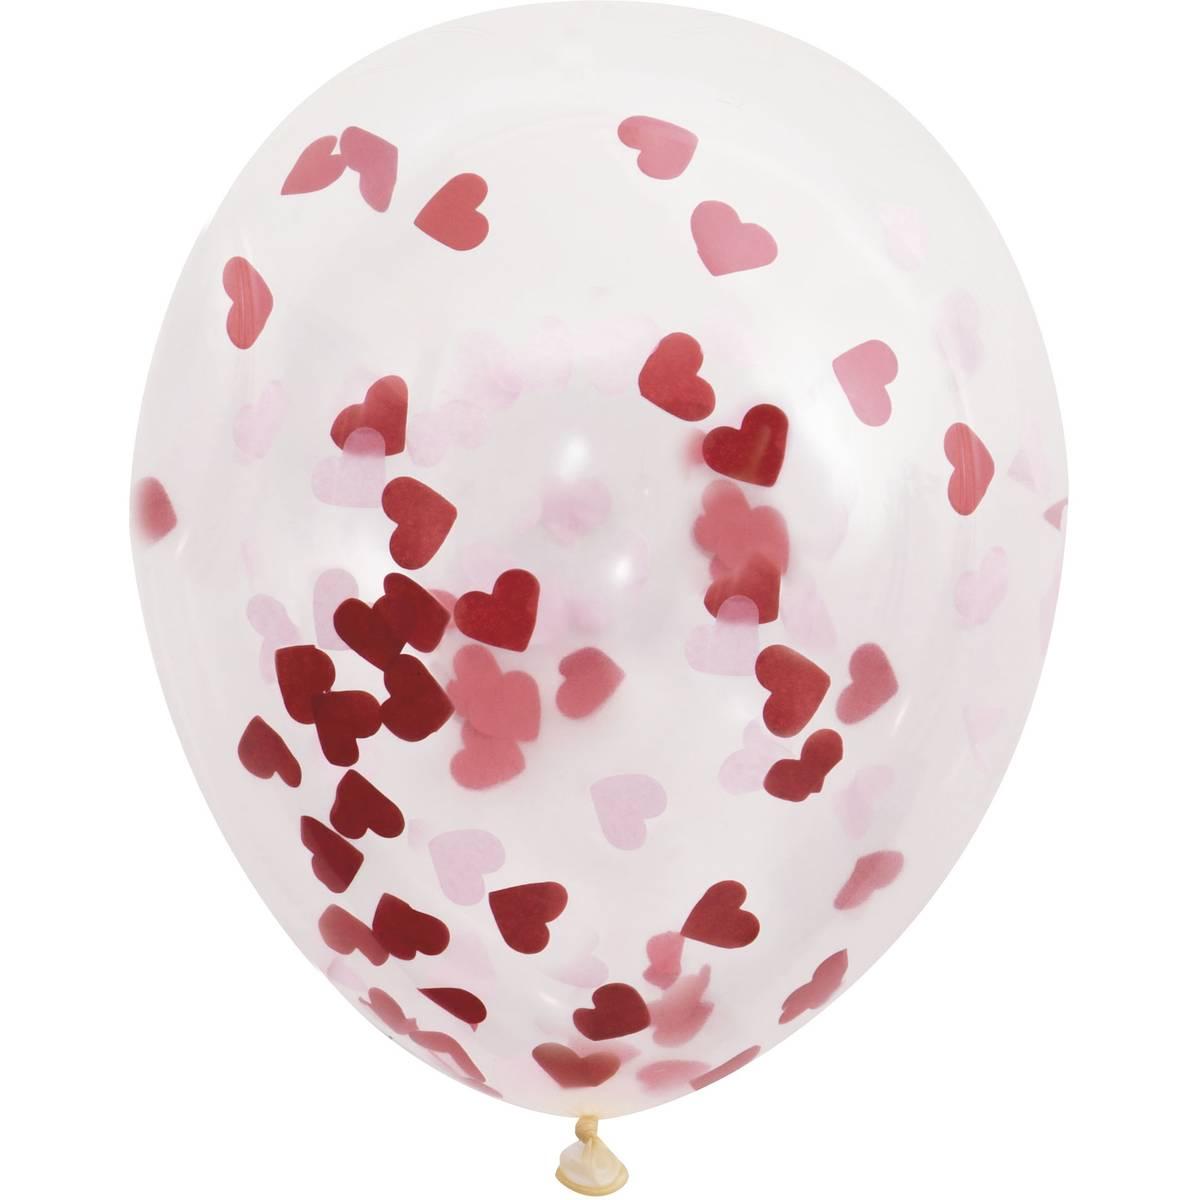 Red Heart Confetti Balloon